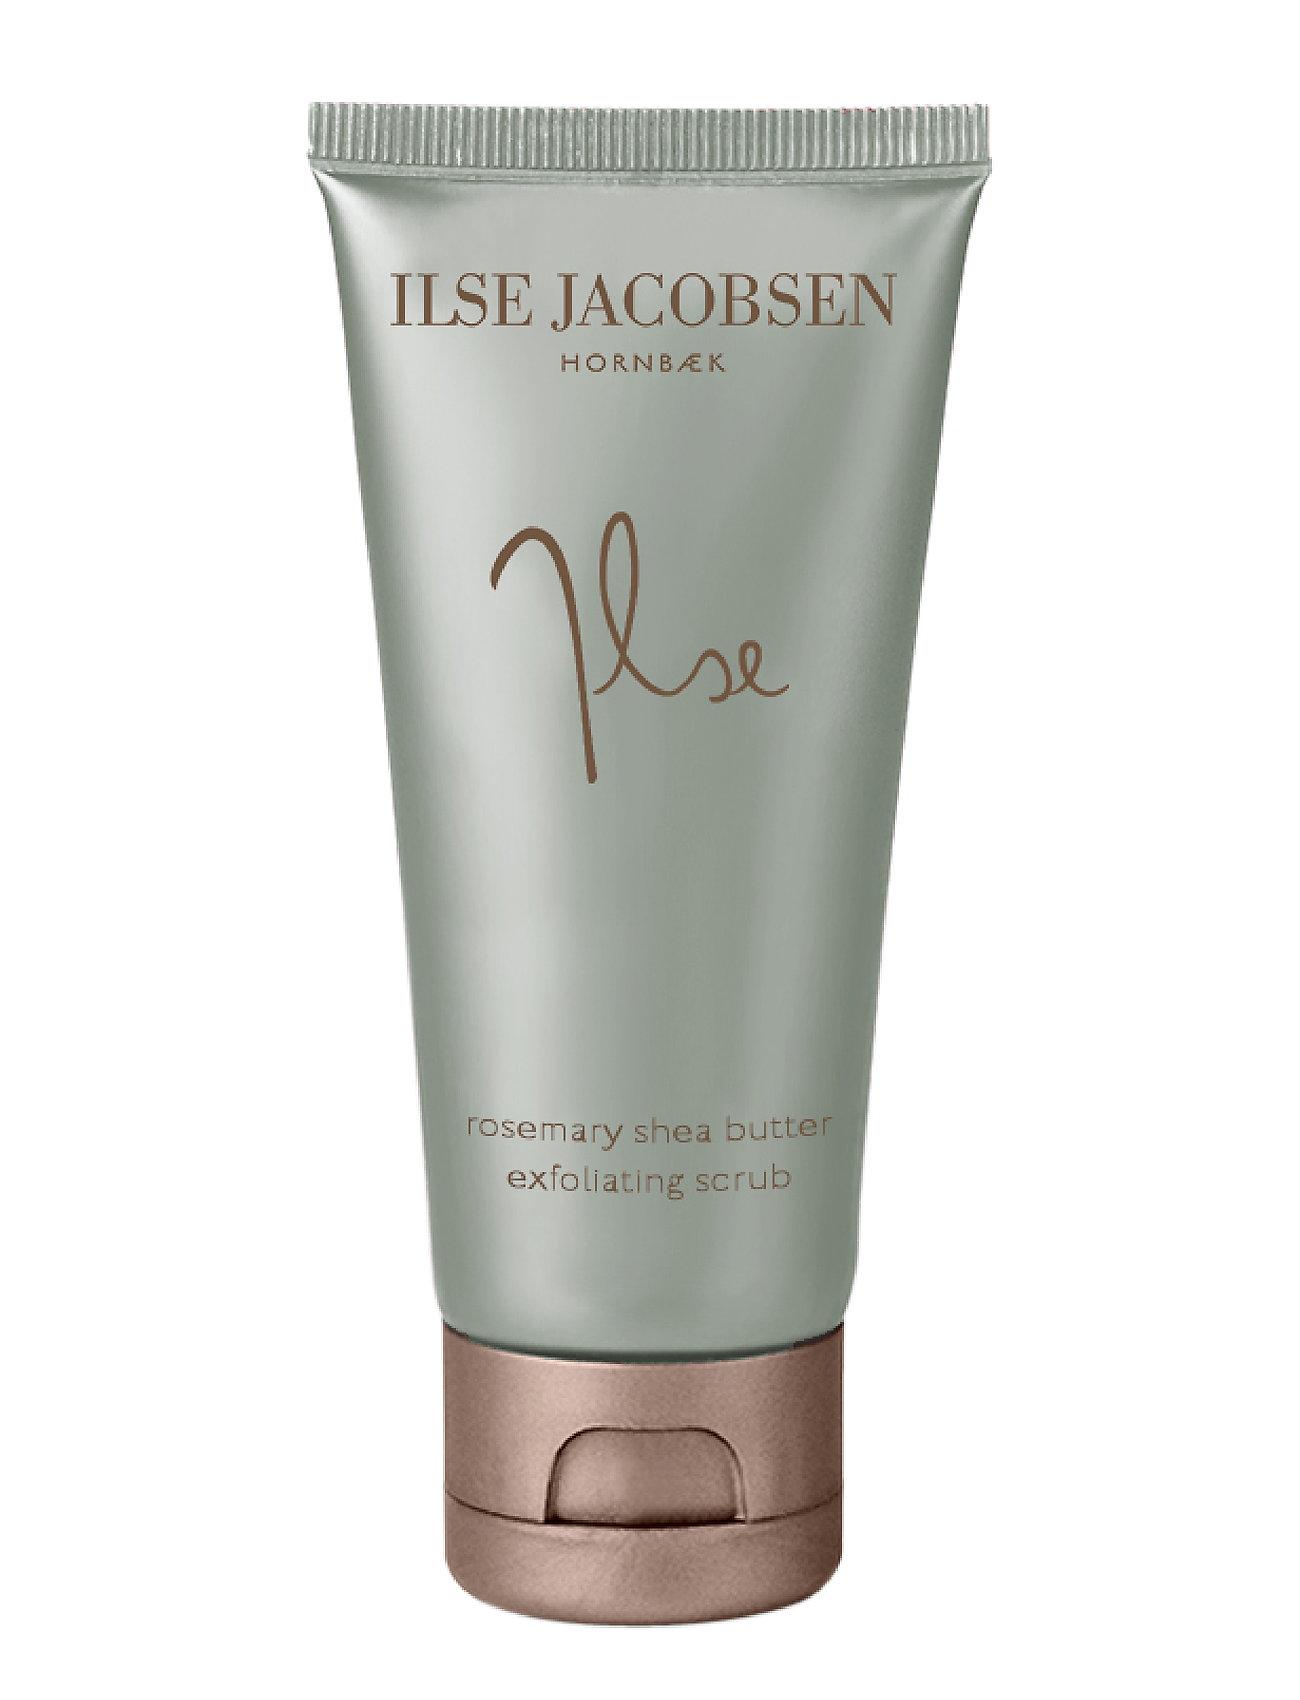 ilse jacobsen spa & beauty – Ilse jacobsen face exfoliating rose på boozt.com dk